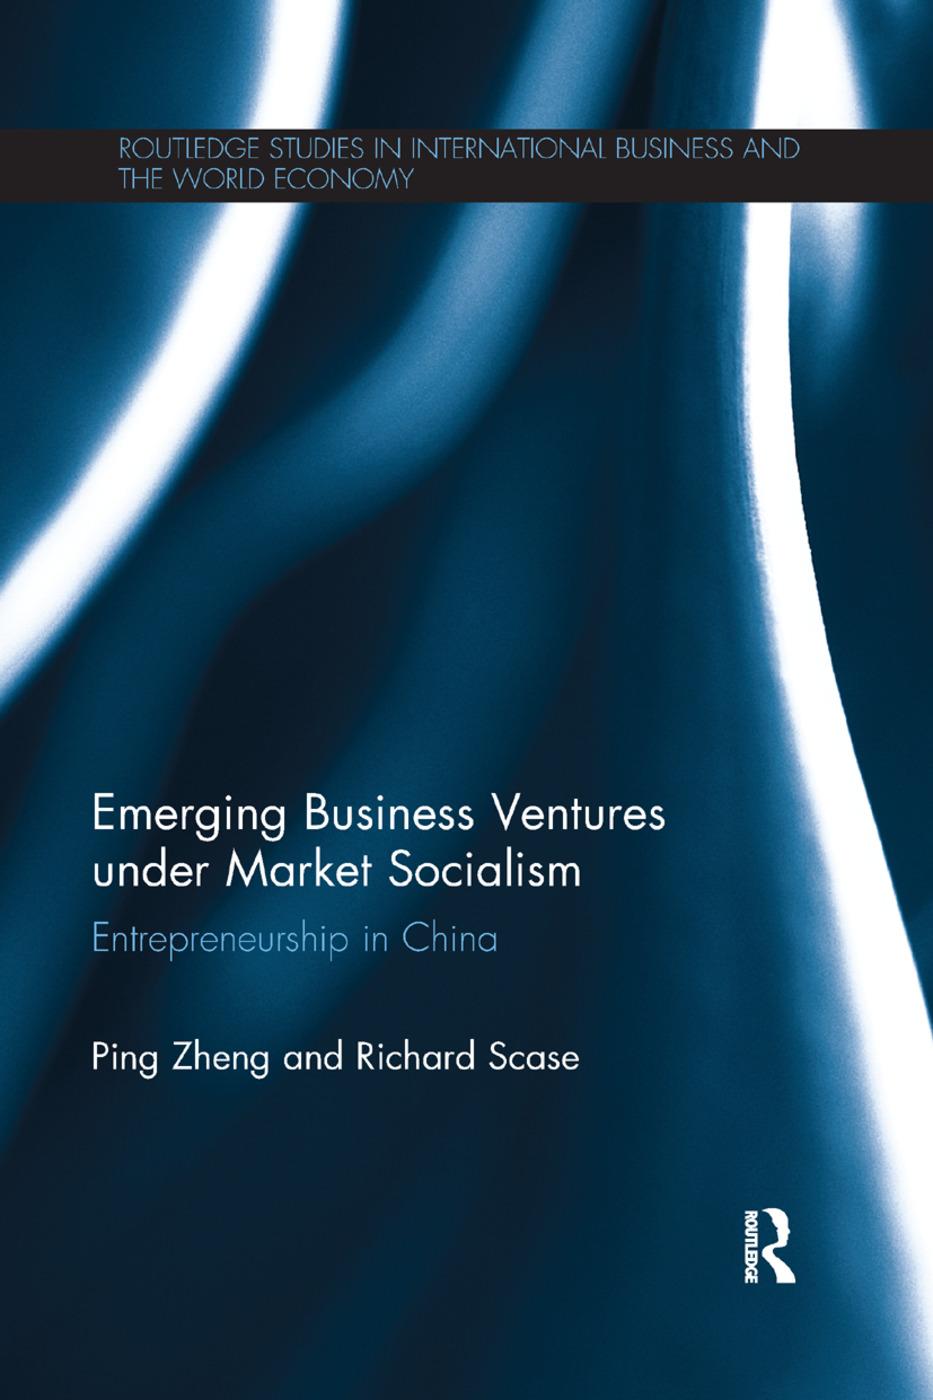 Emerging Business Ventures under Market Socialism: Entrepreneurship in China book cover